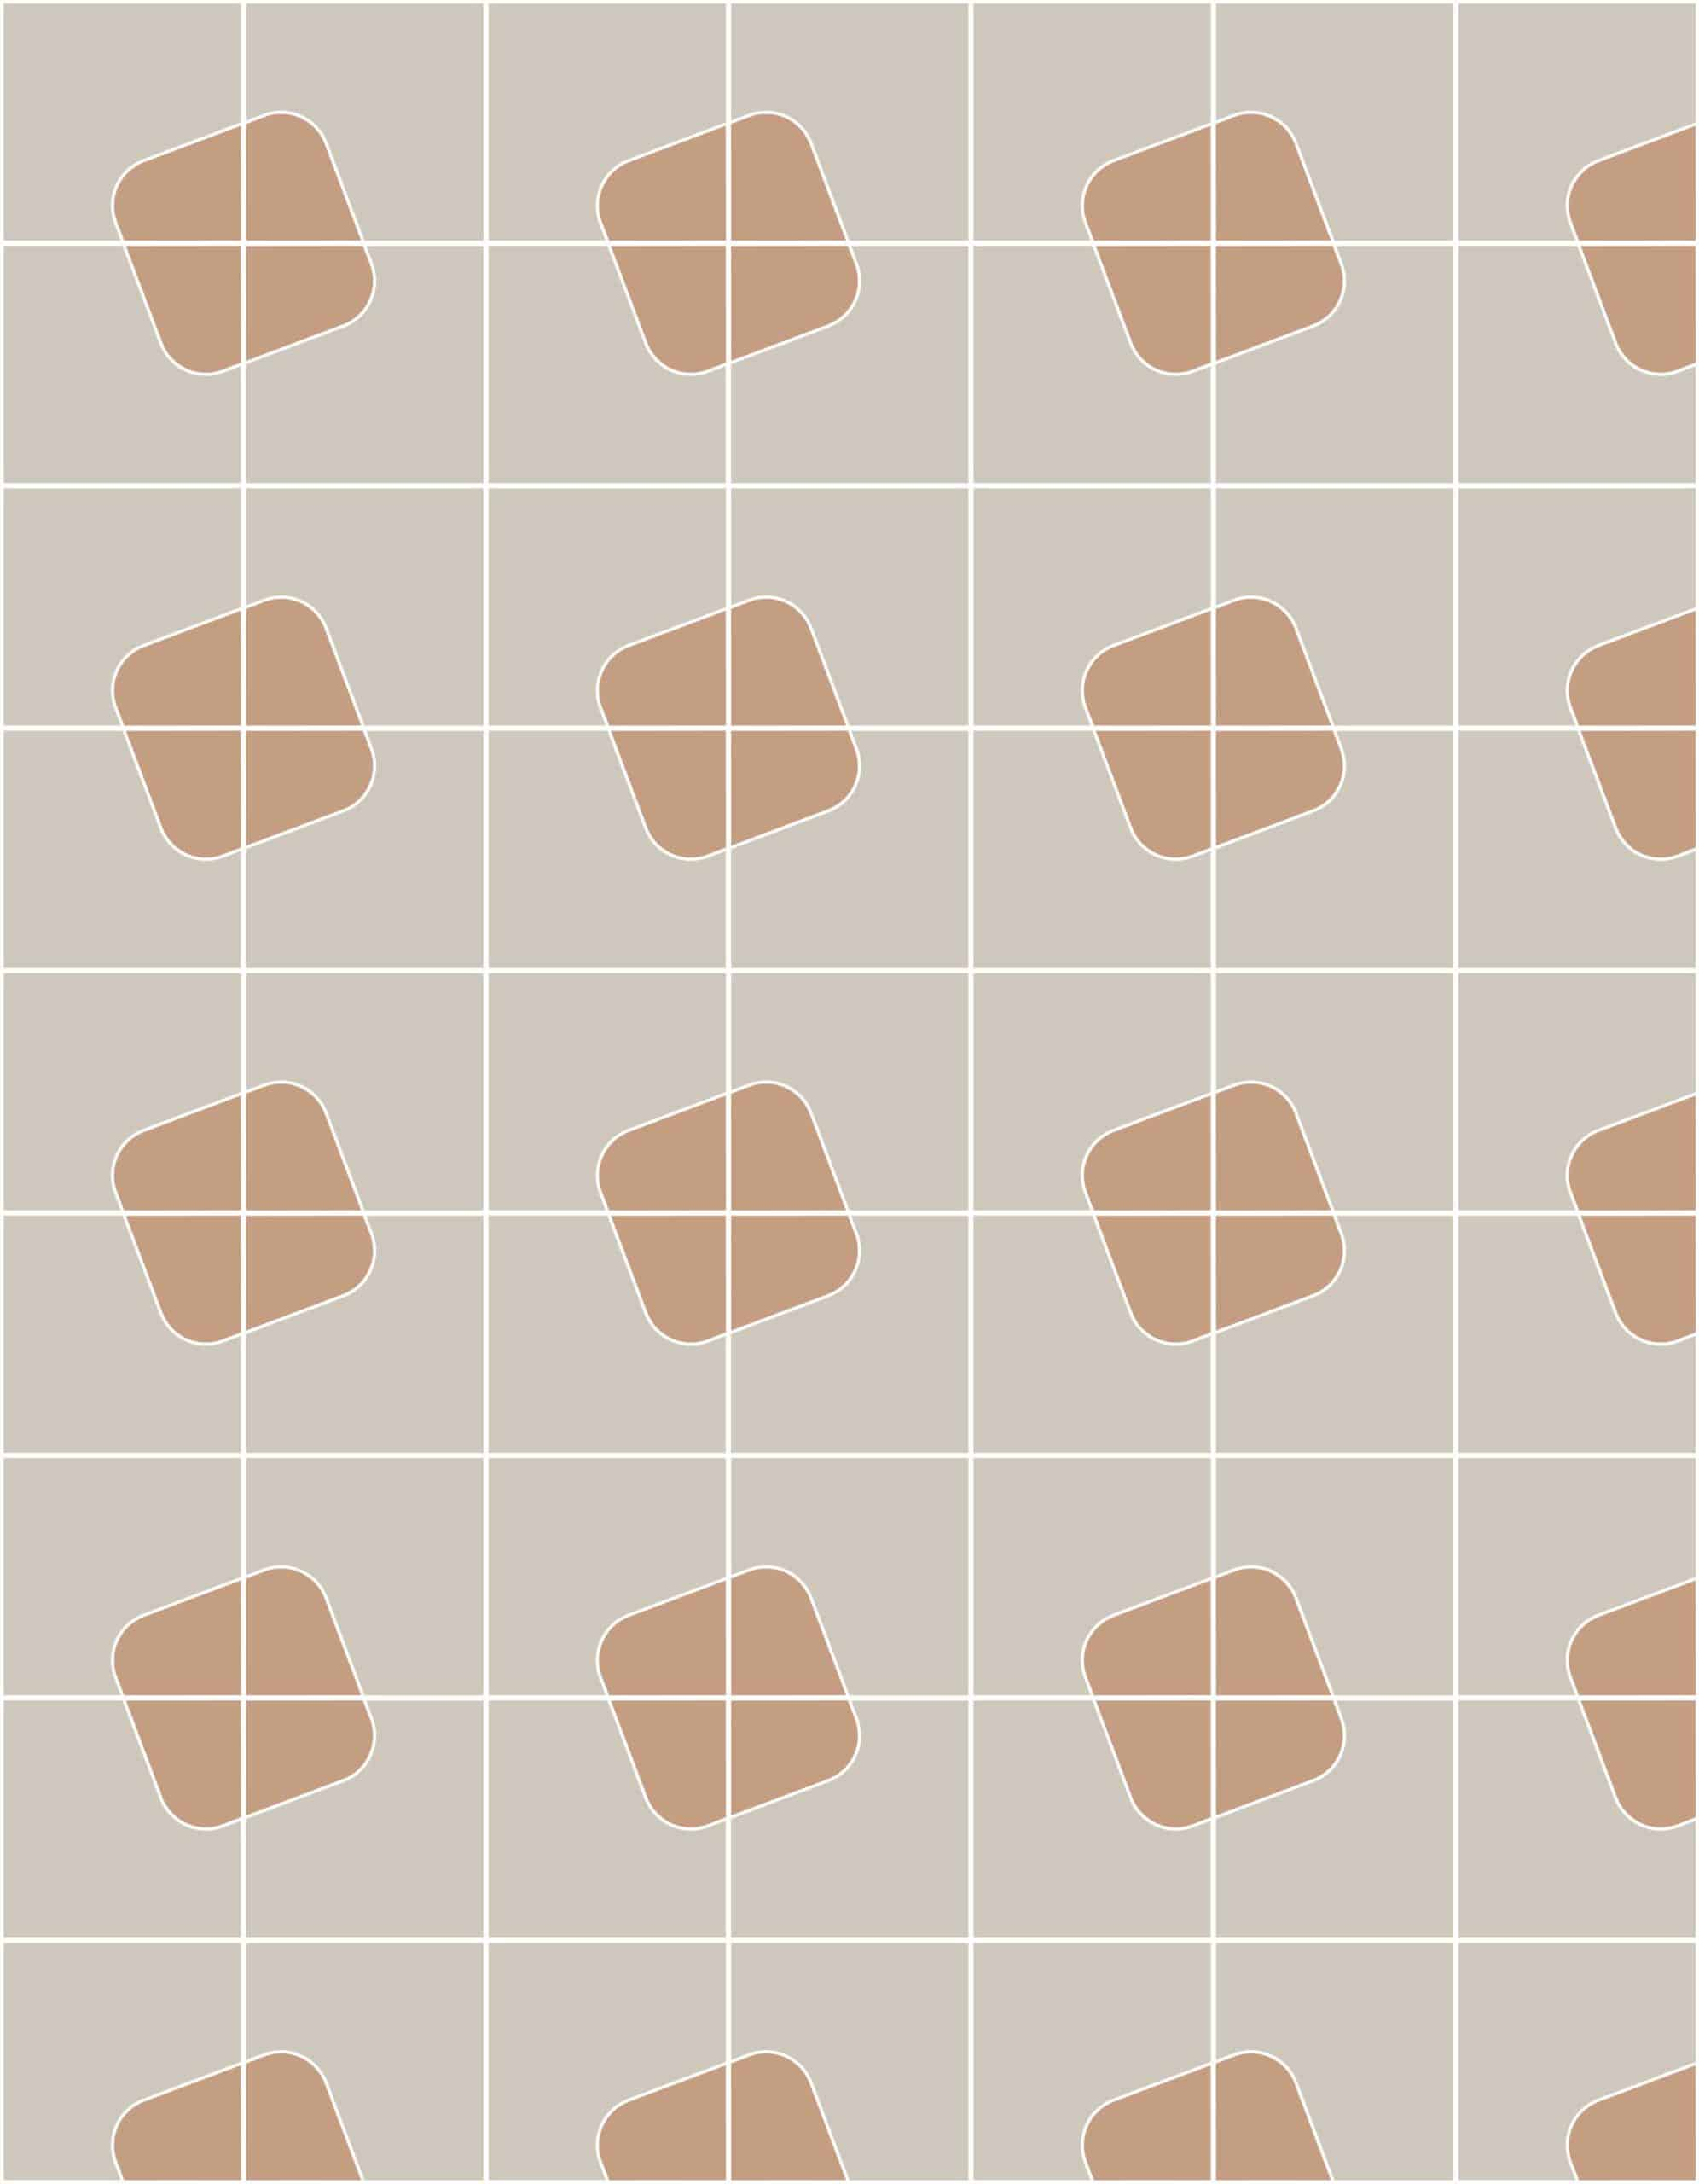 Quilt Chalk Cameo Tiles